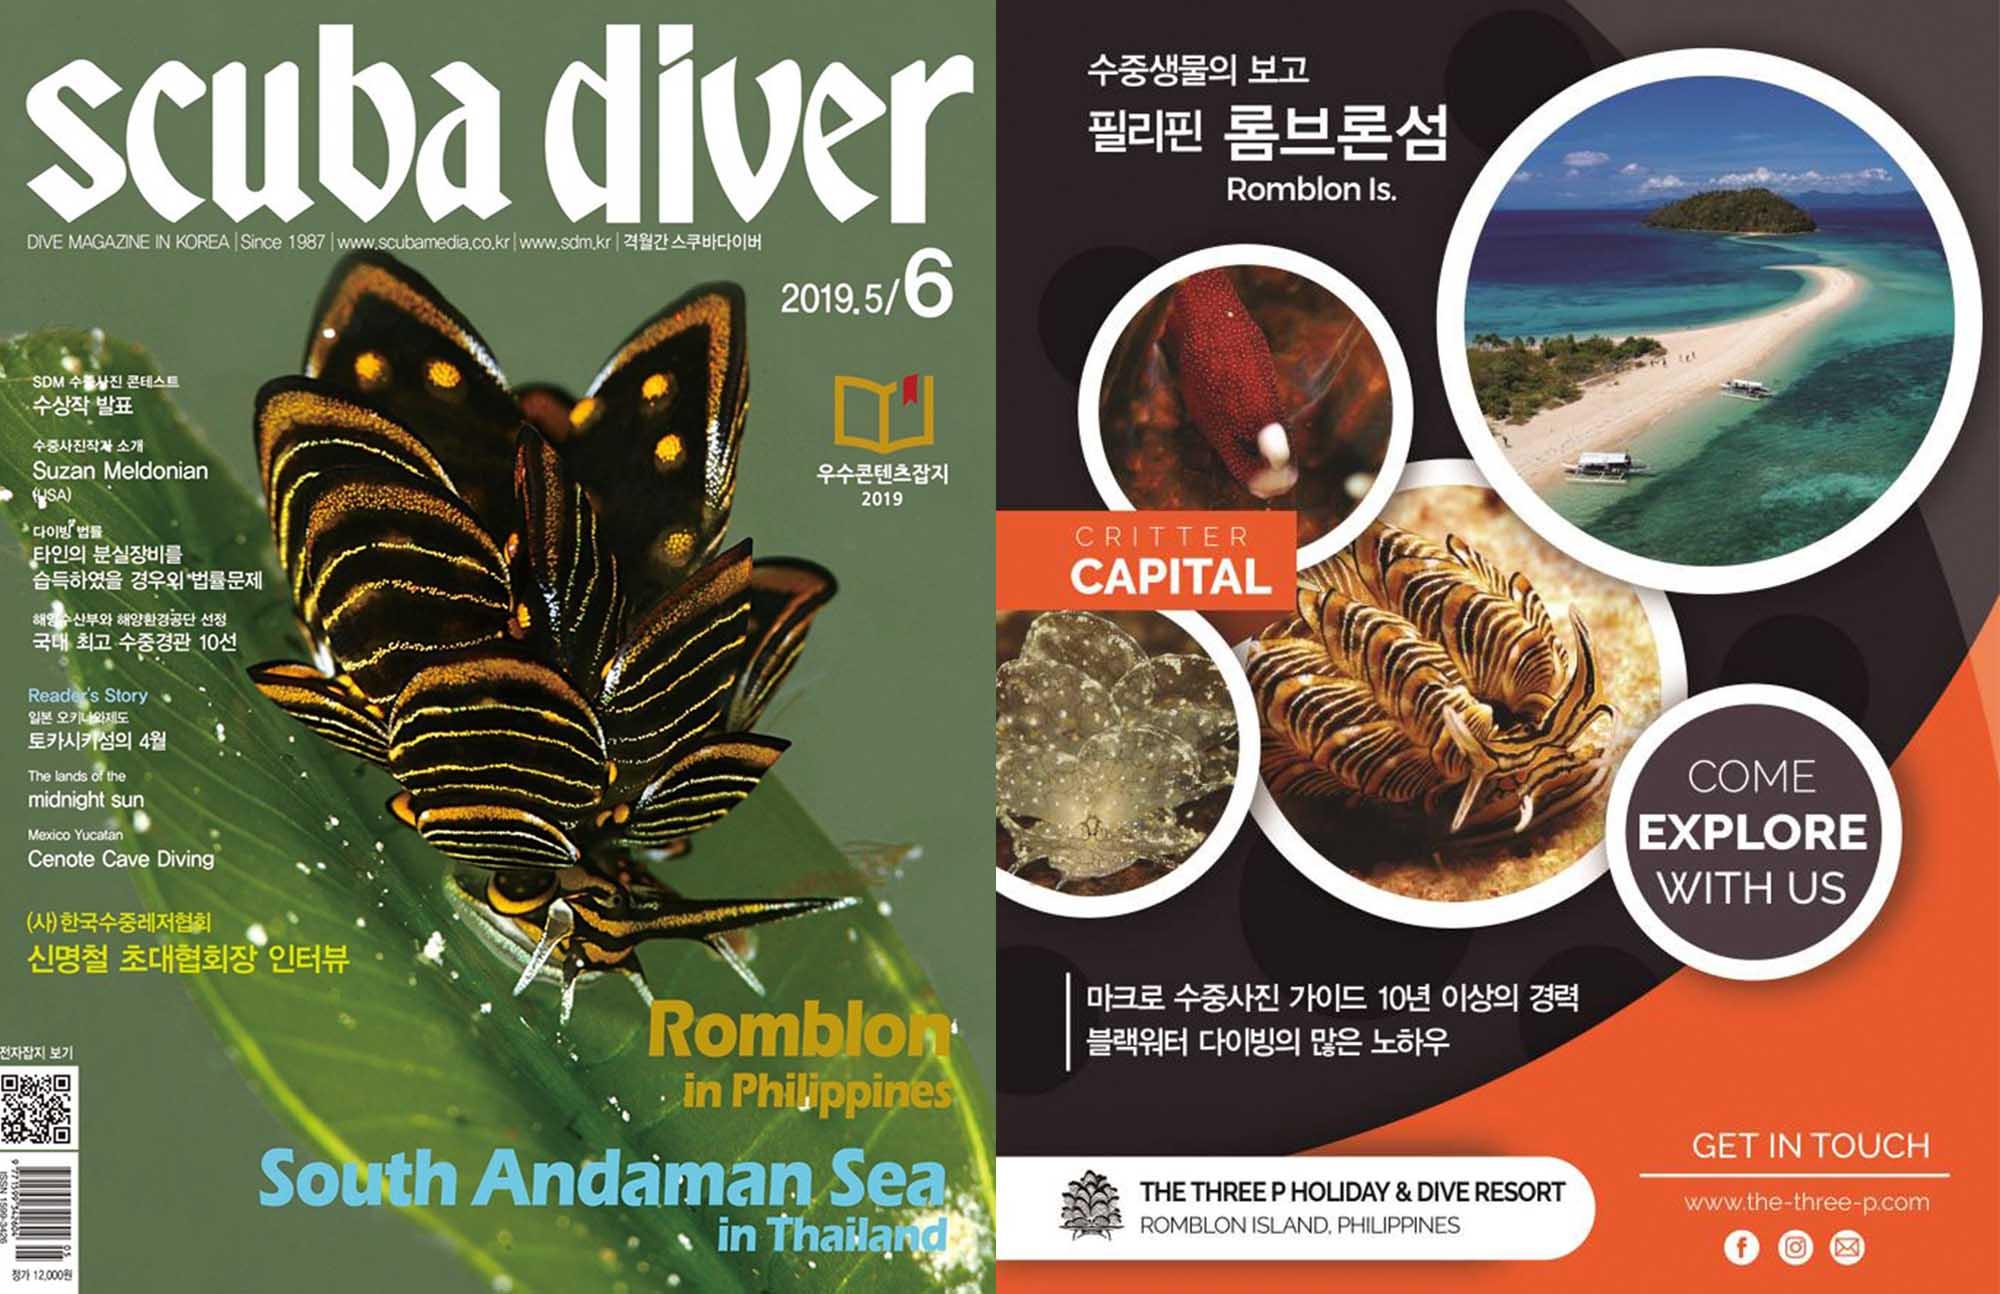 www.the-three-p.com-romblon-island-underwater-macro-photography-scuba-diving-philippines-publications-scuba-diver-magazine-korea-article-2019-cover